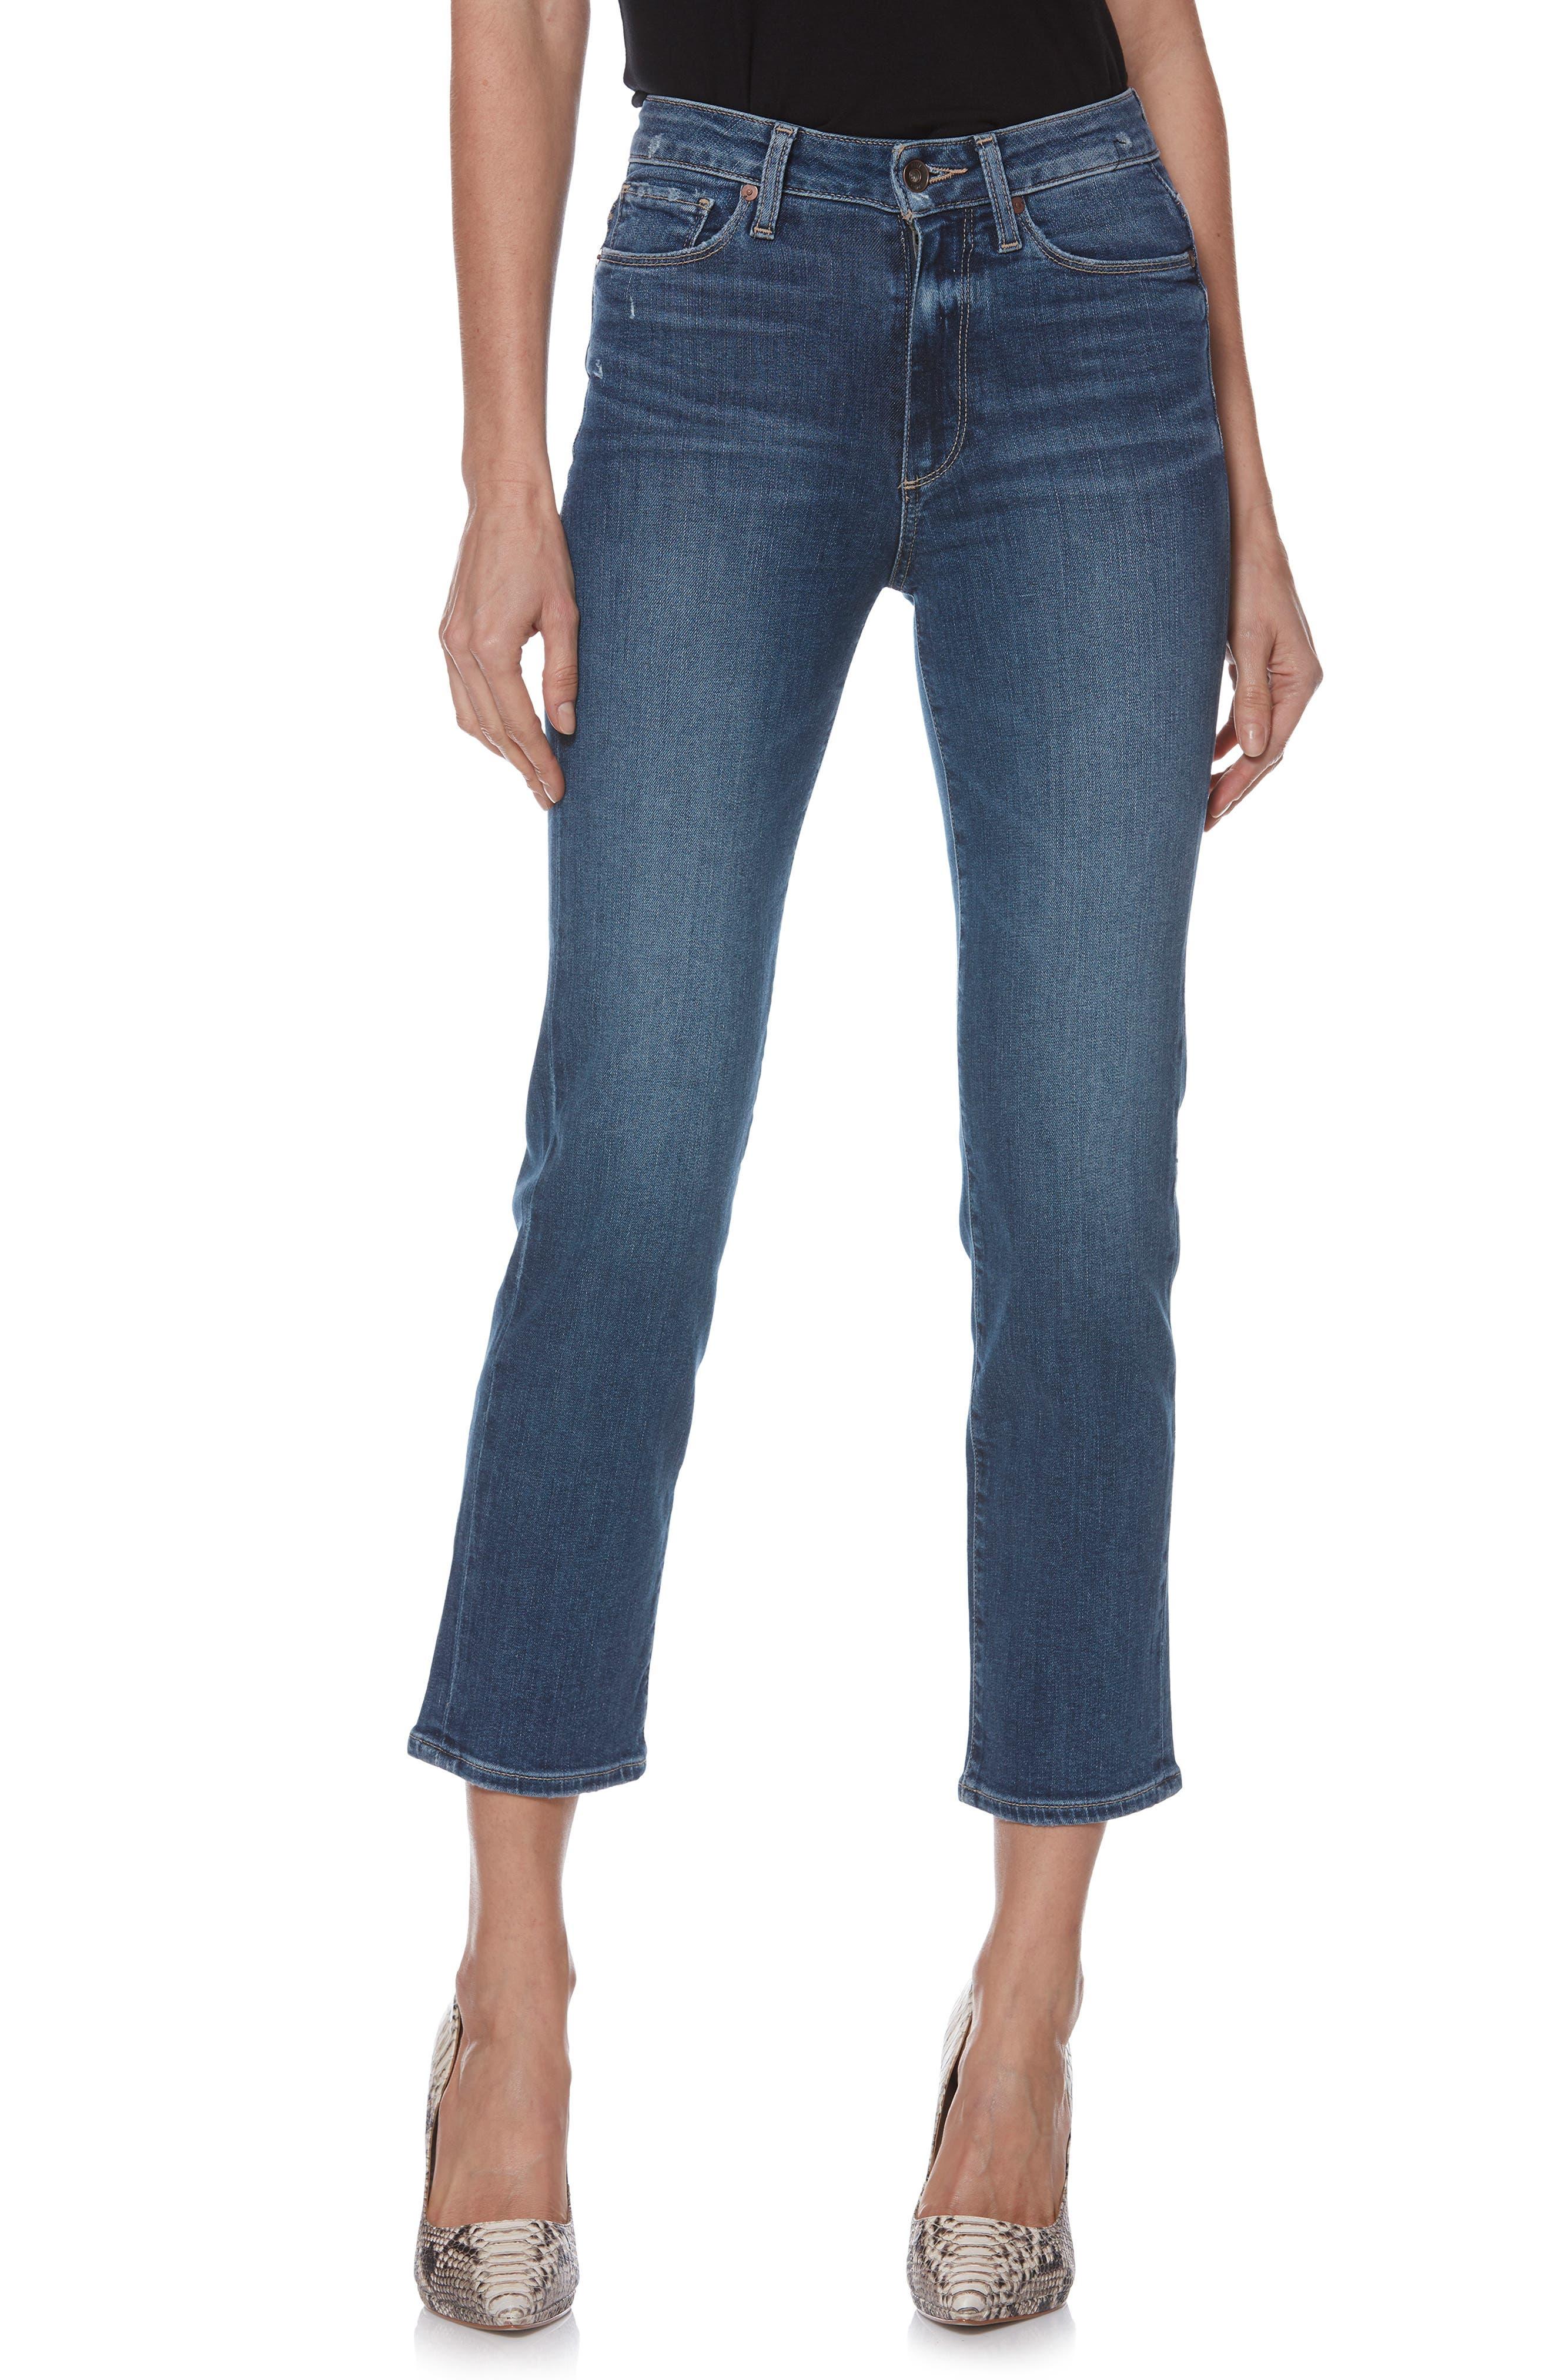 Transcend Vintage - Margot High Waist Ankle Straight Leg Jeans,                             Main thumbnail 1, color,                             HANNIE